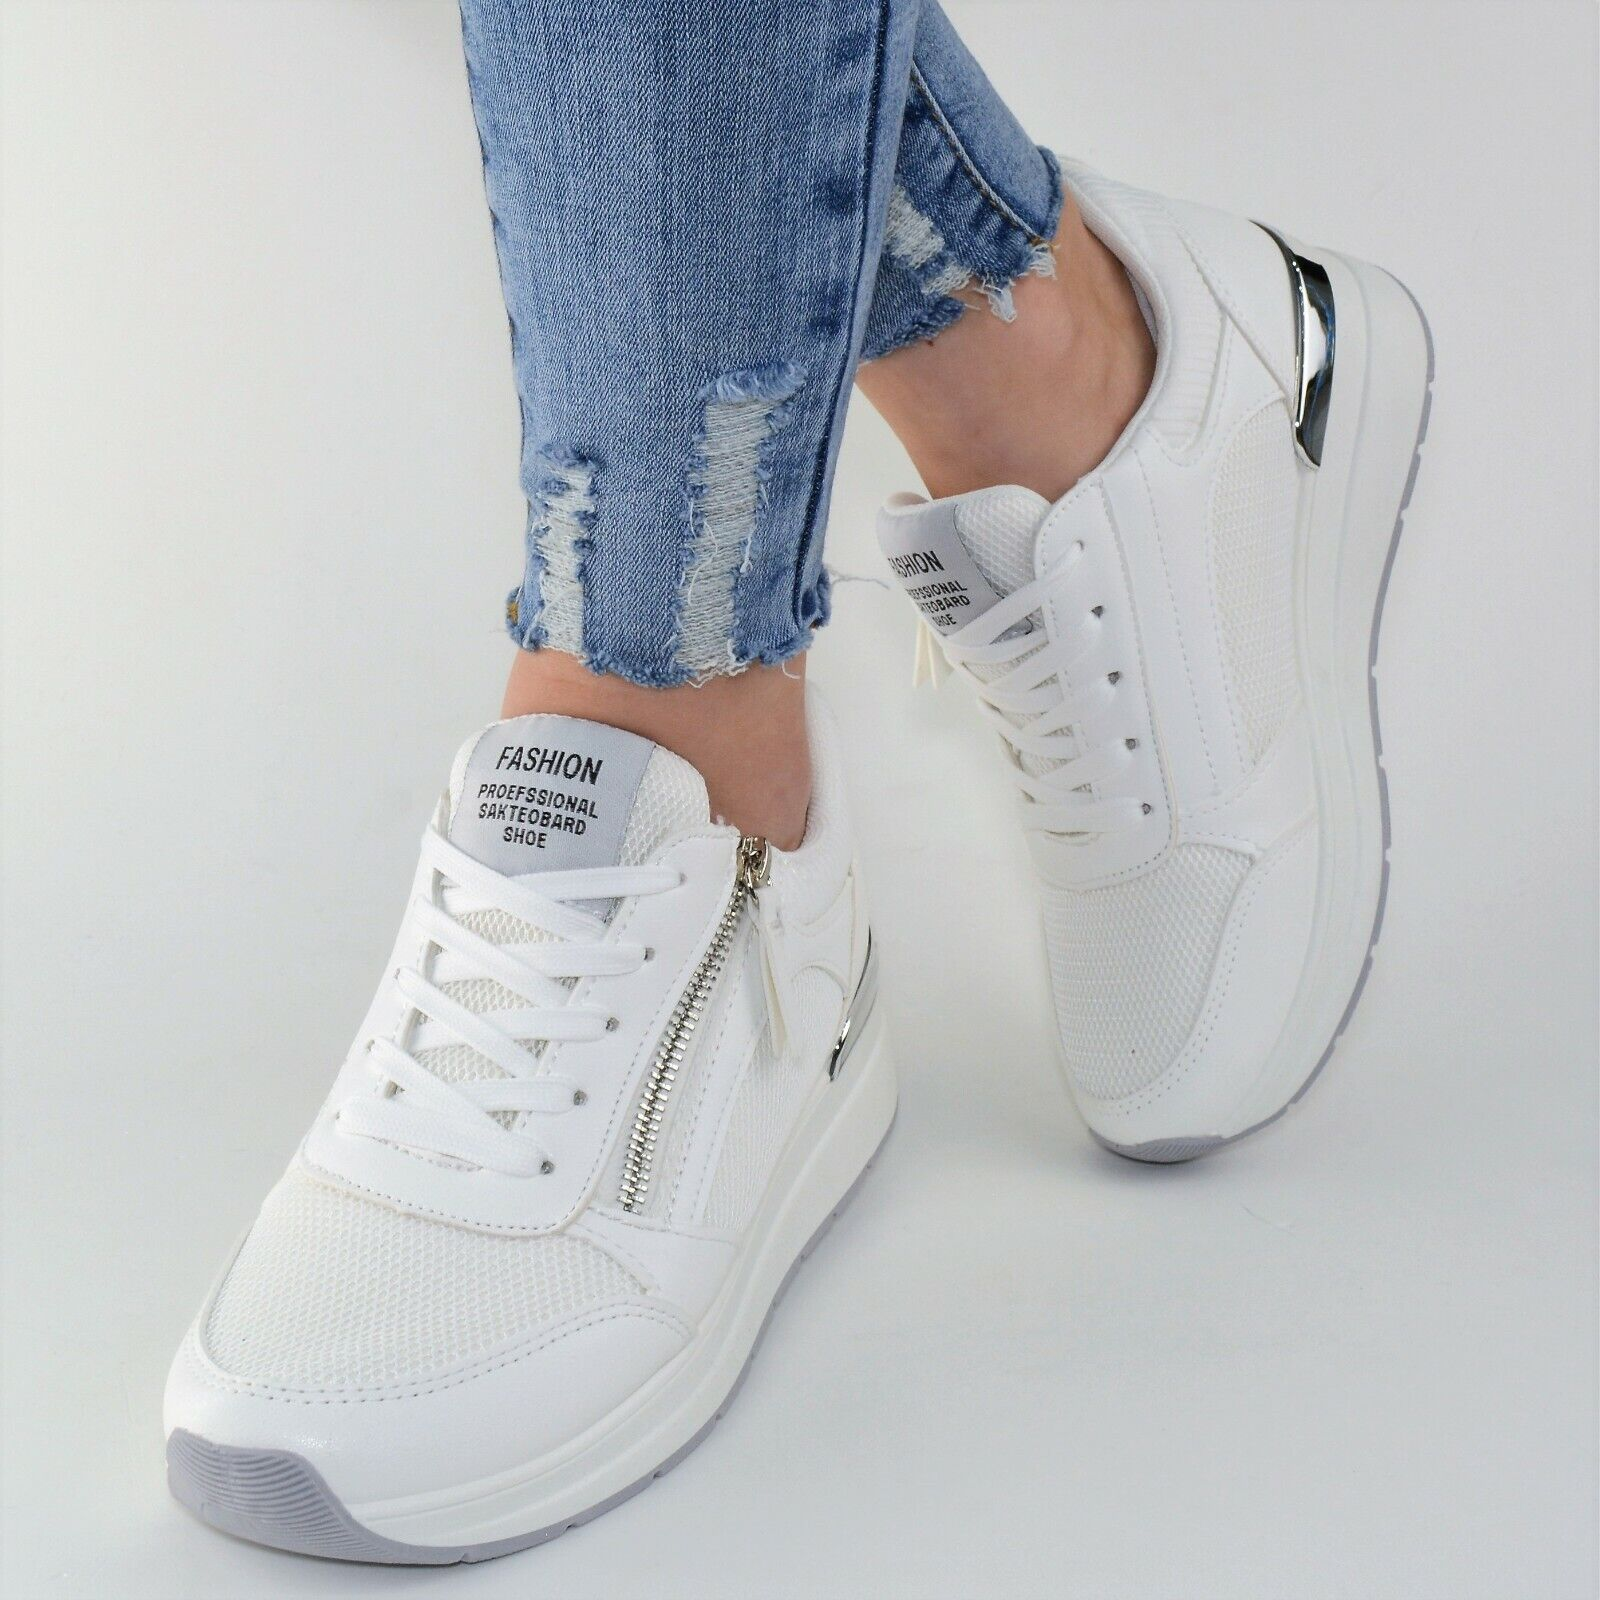 damen schuhe sneaker weiss wei plateau glitzer